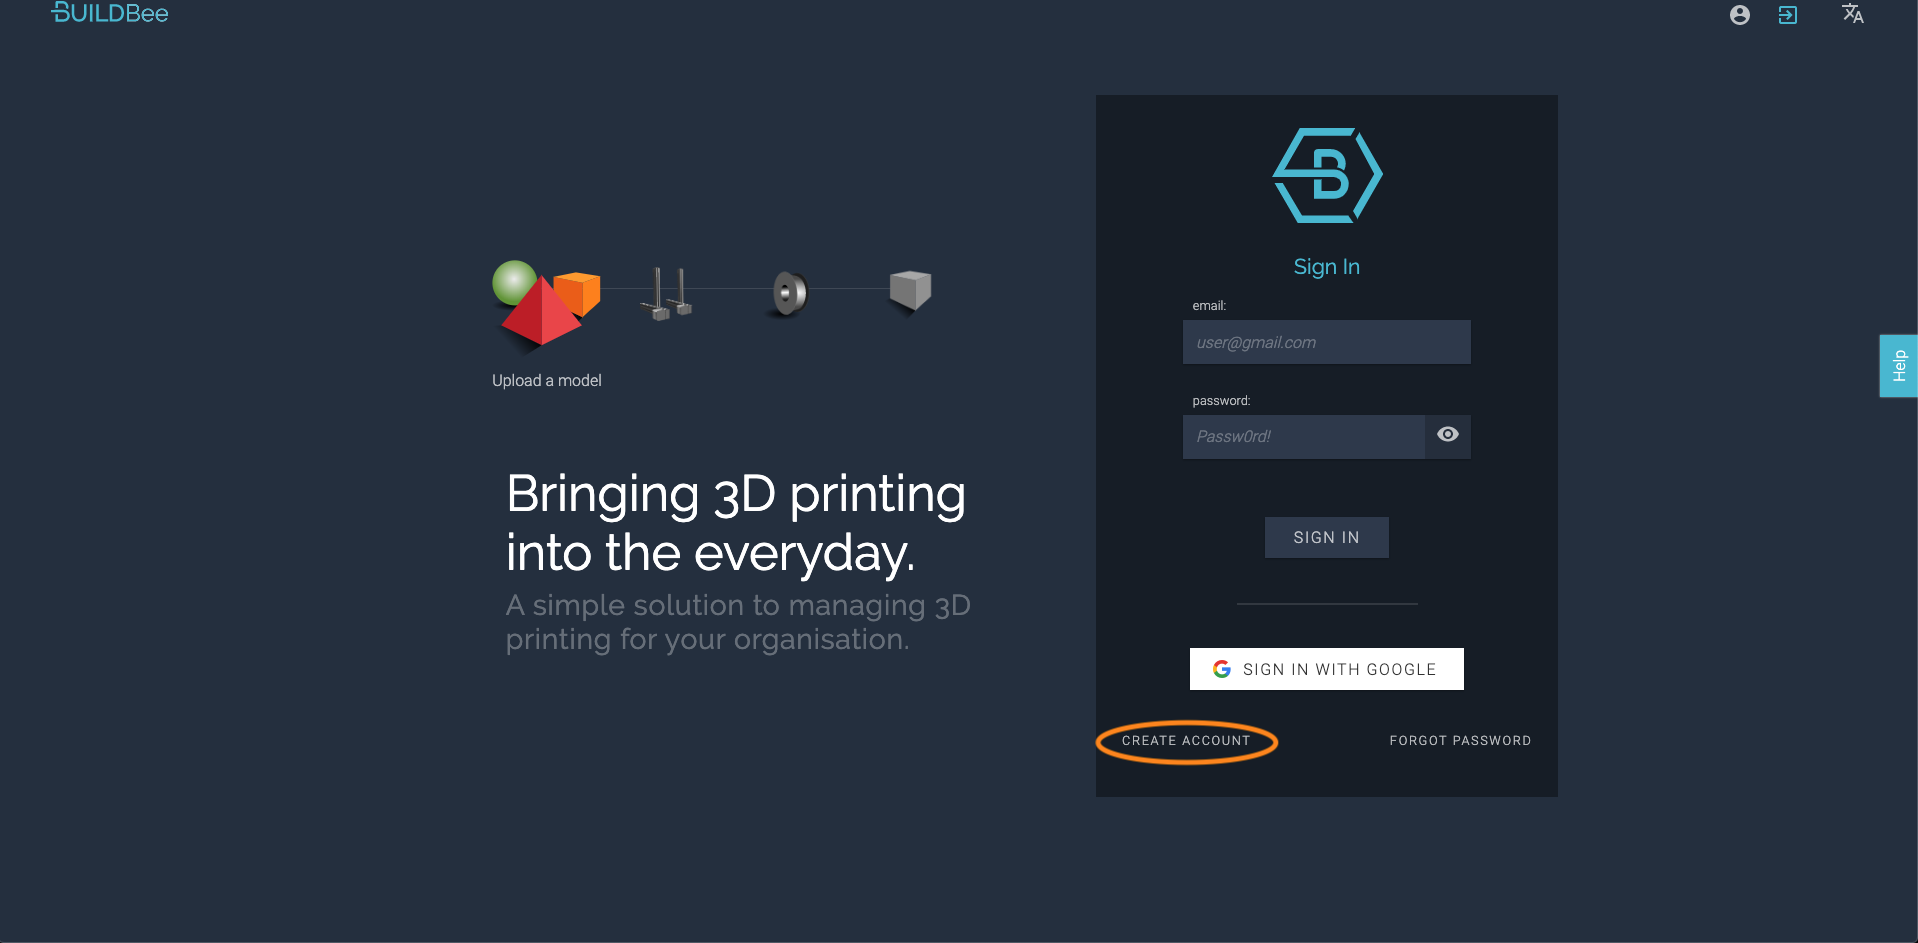 BuildBee create account